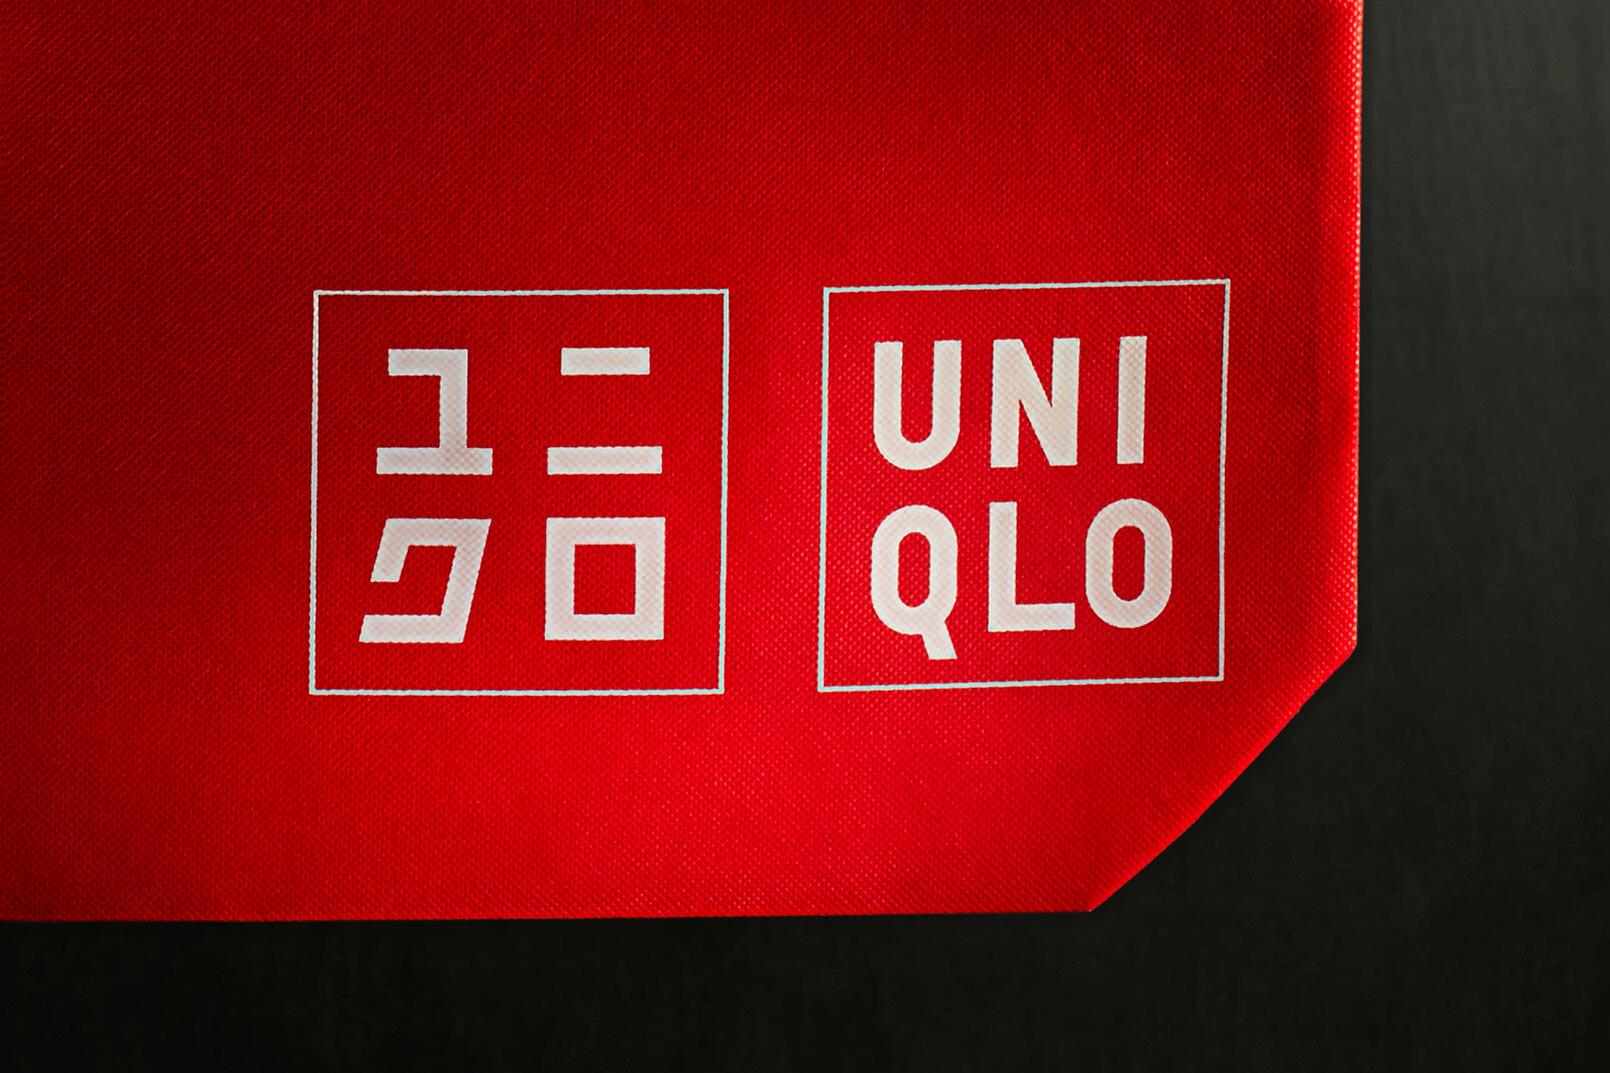 Uniqlo-Drawstring-Bag-Pouch-Ribbon-Silksckeen-结构包装 - 设计 - 切割和缝制-JPG